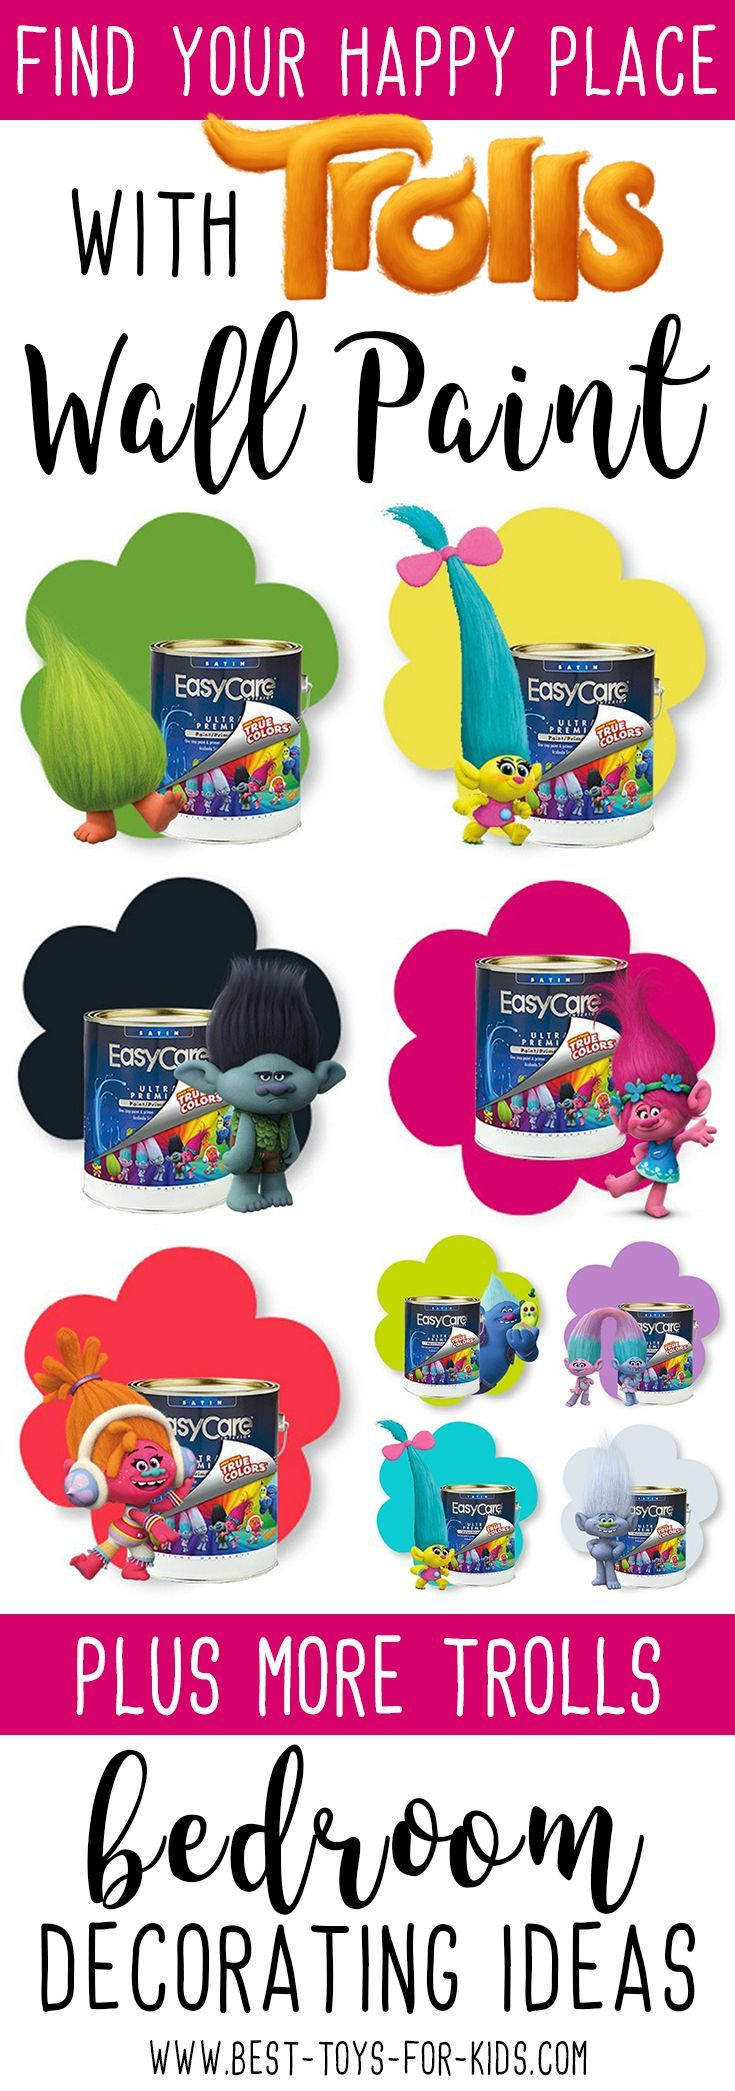 Dreamy Trolls Decorating Ideas For Bedrooms Best Toys For Kids Bedroom Decor Room Ideas Bedroom Kids Bedroom Decor